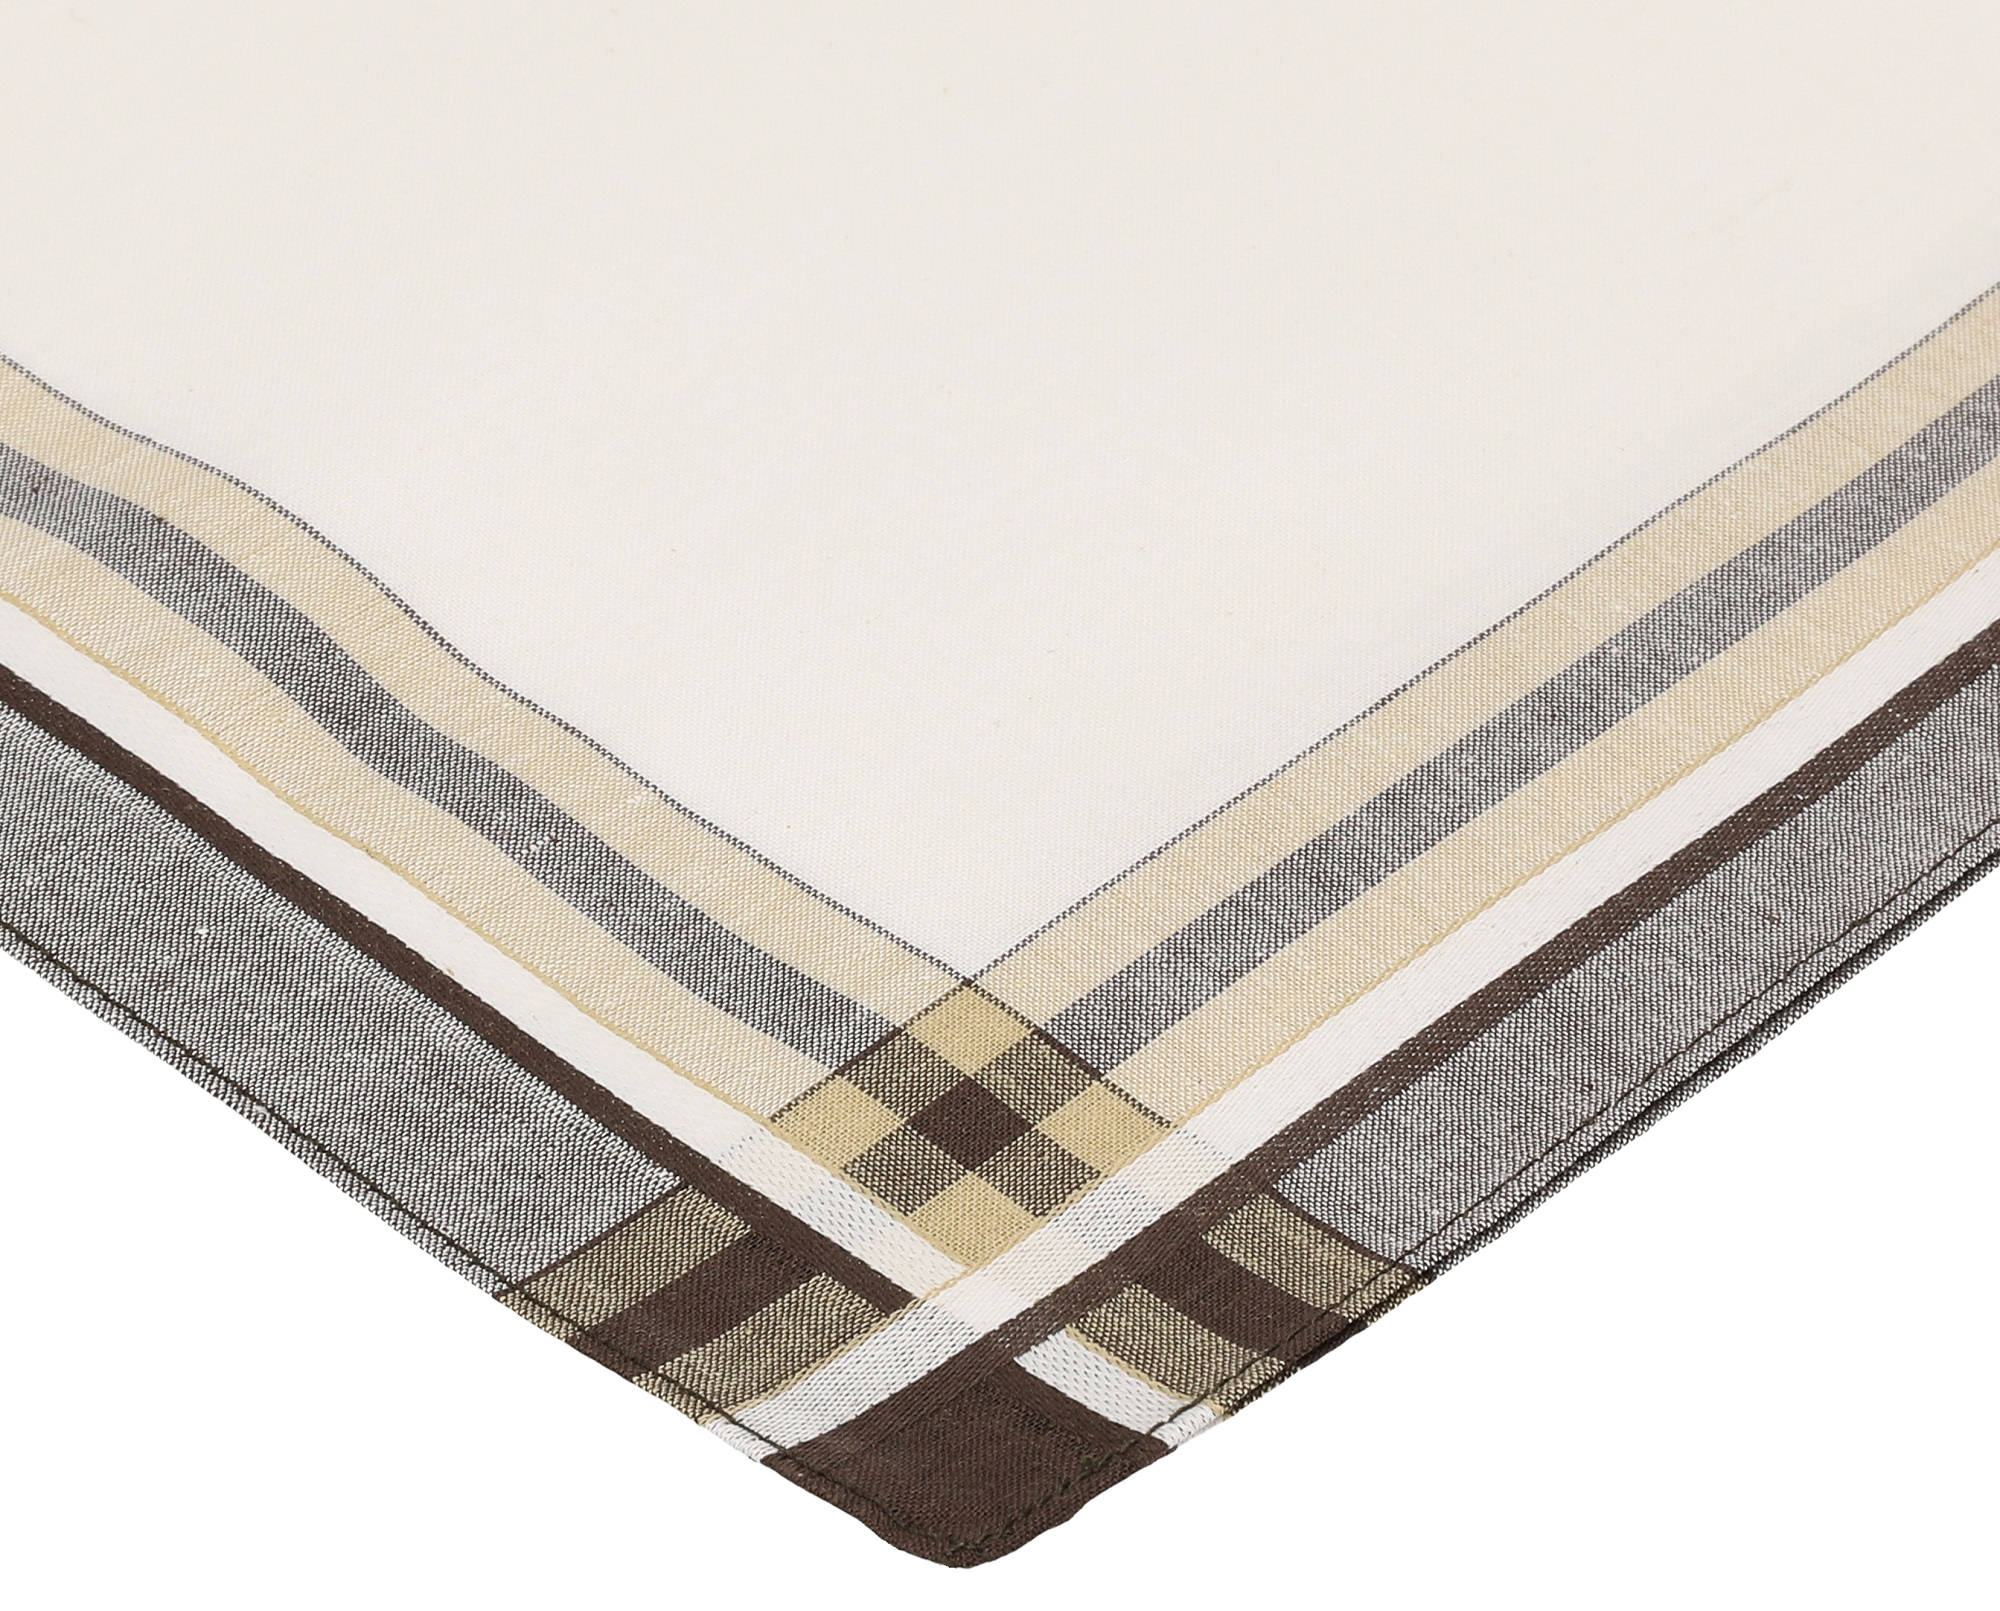 BETZ Juego de pa/ñuelos LEO 5 de tejido para caballeros 100/% algod/ón 40x40 cm dise/ño 1